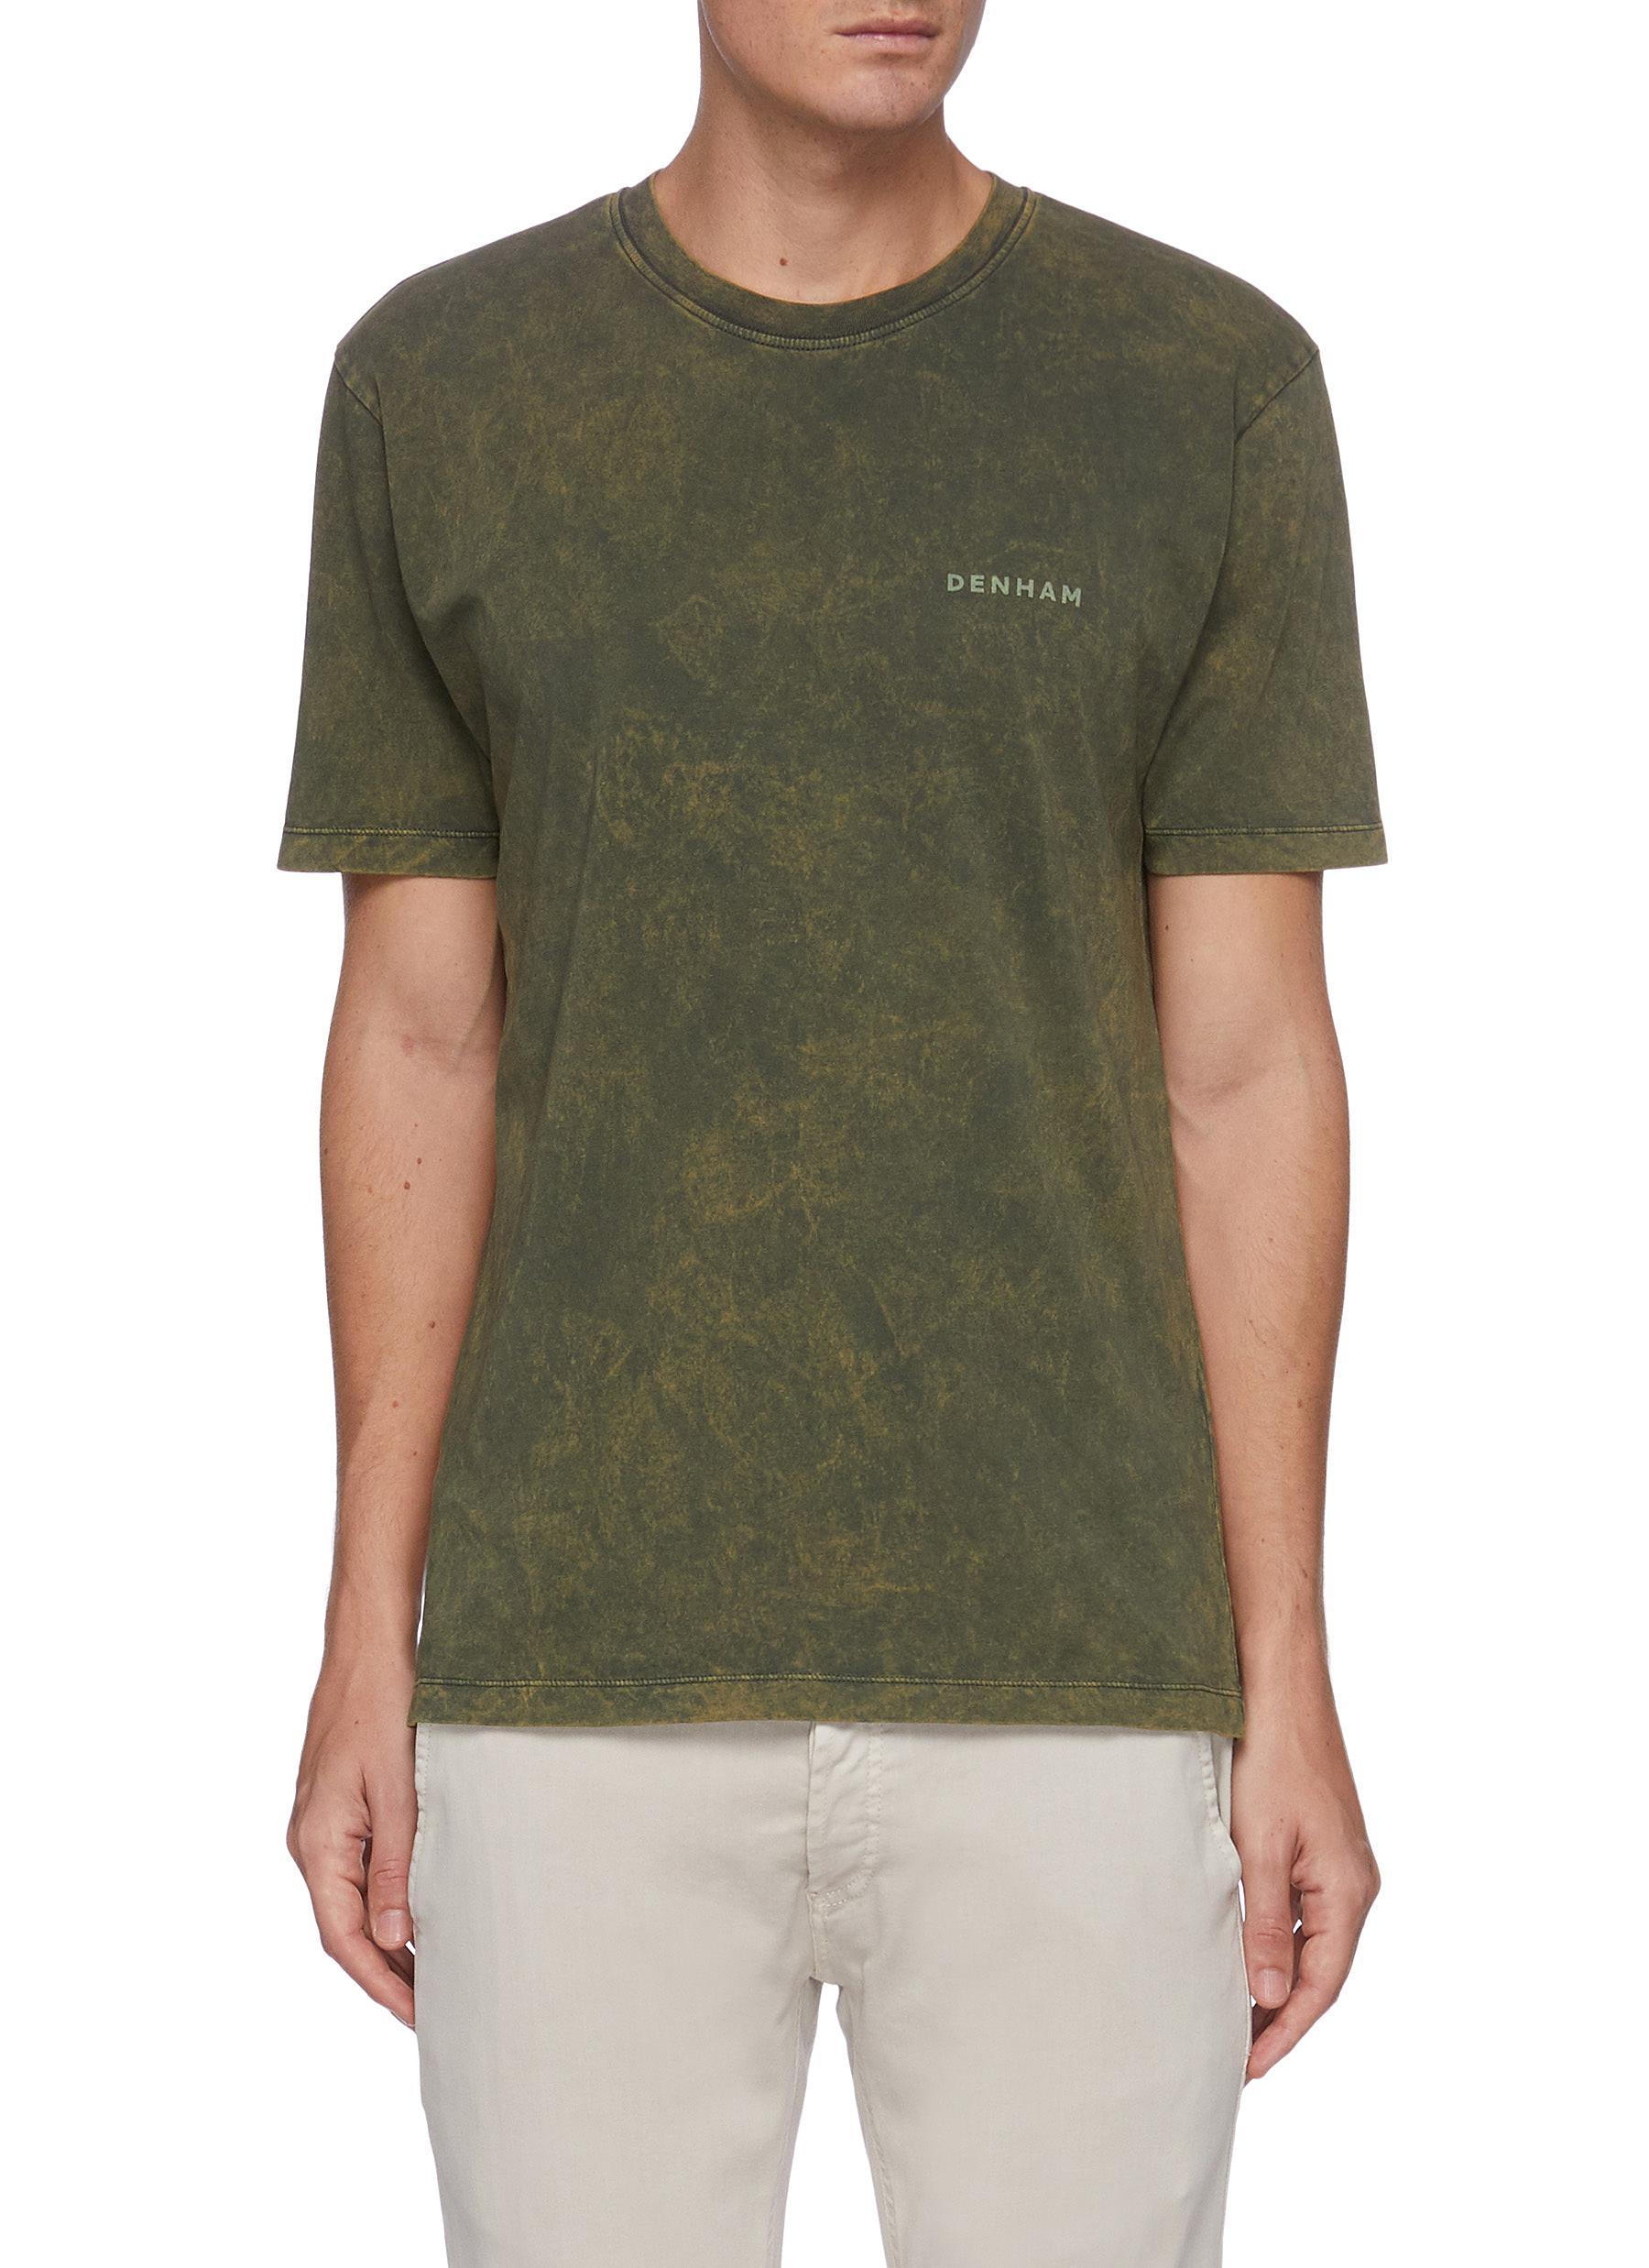 'Baker Model' Wash Out Effect Logo Print Cotton T-shirt